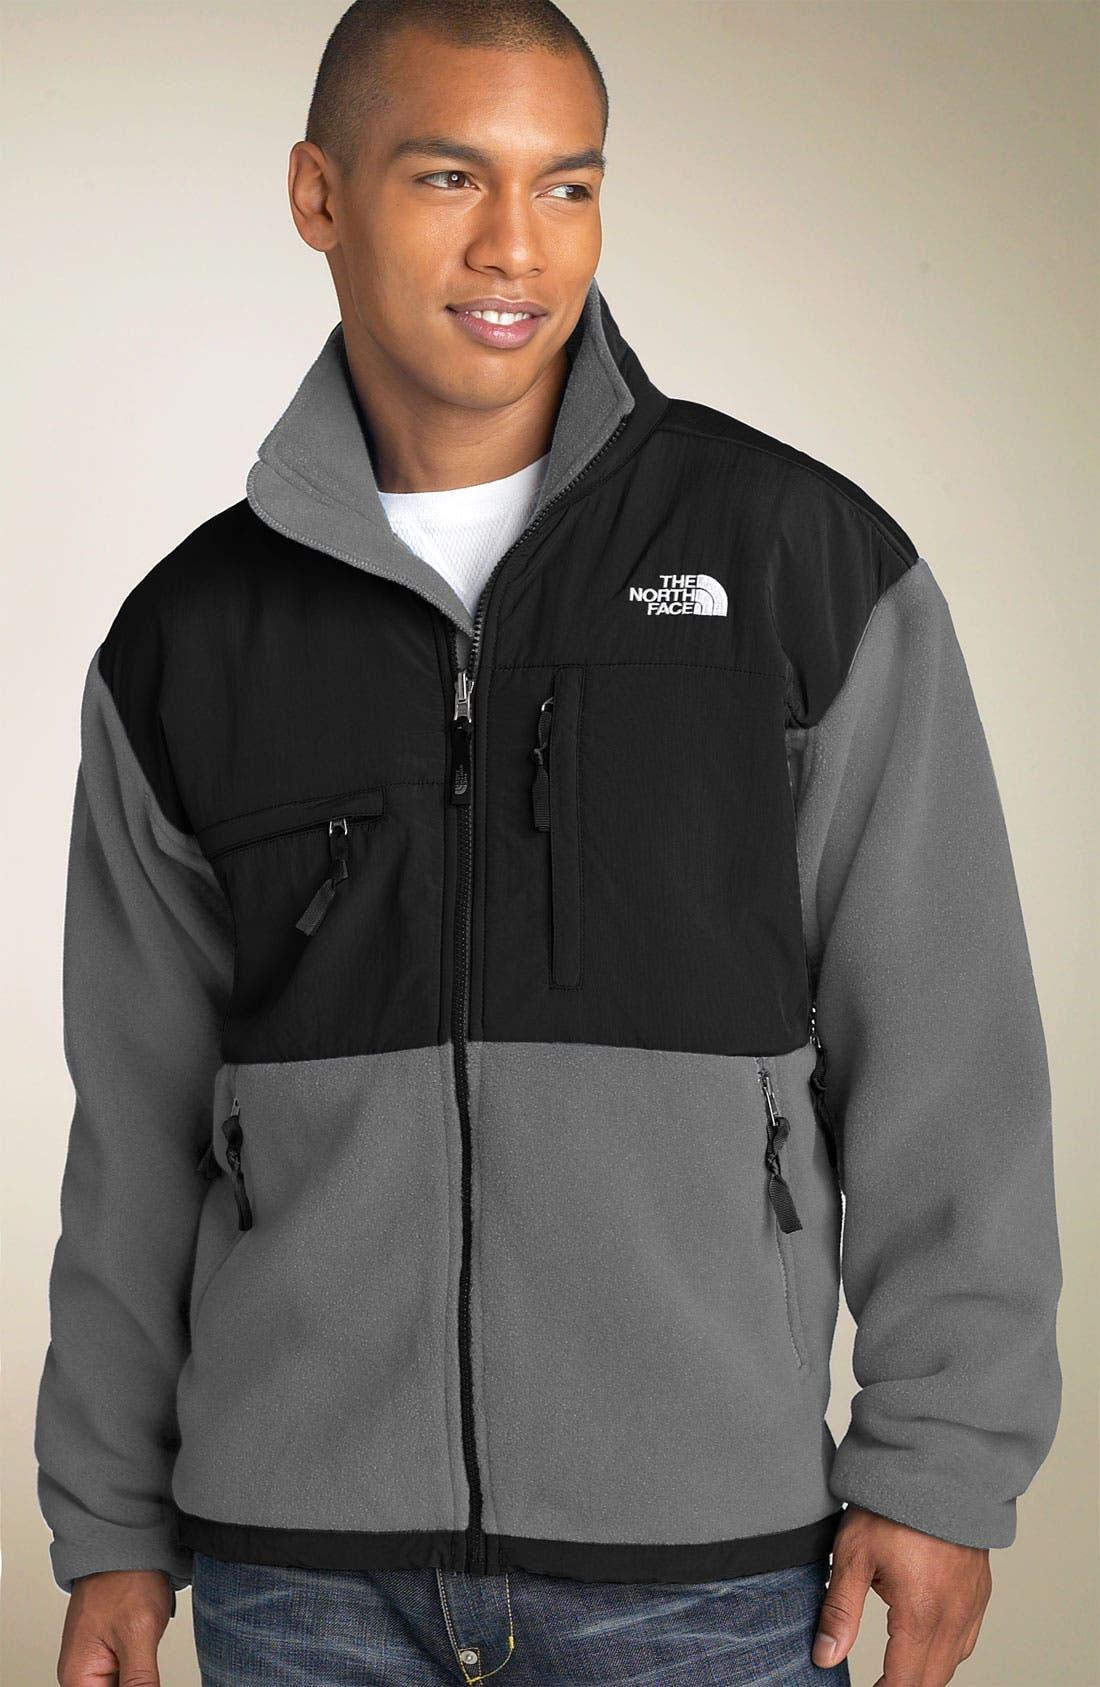 Main Image - The North Face 'Denali' Recycled Fleece Jacket